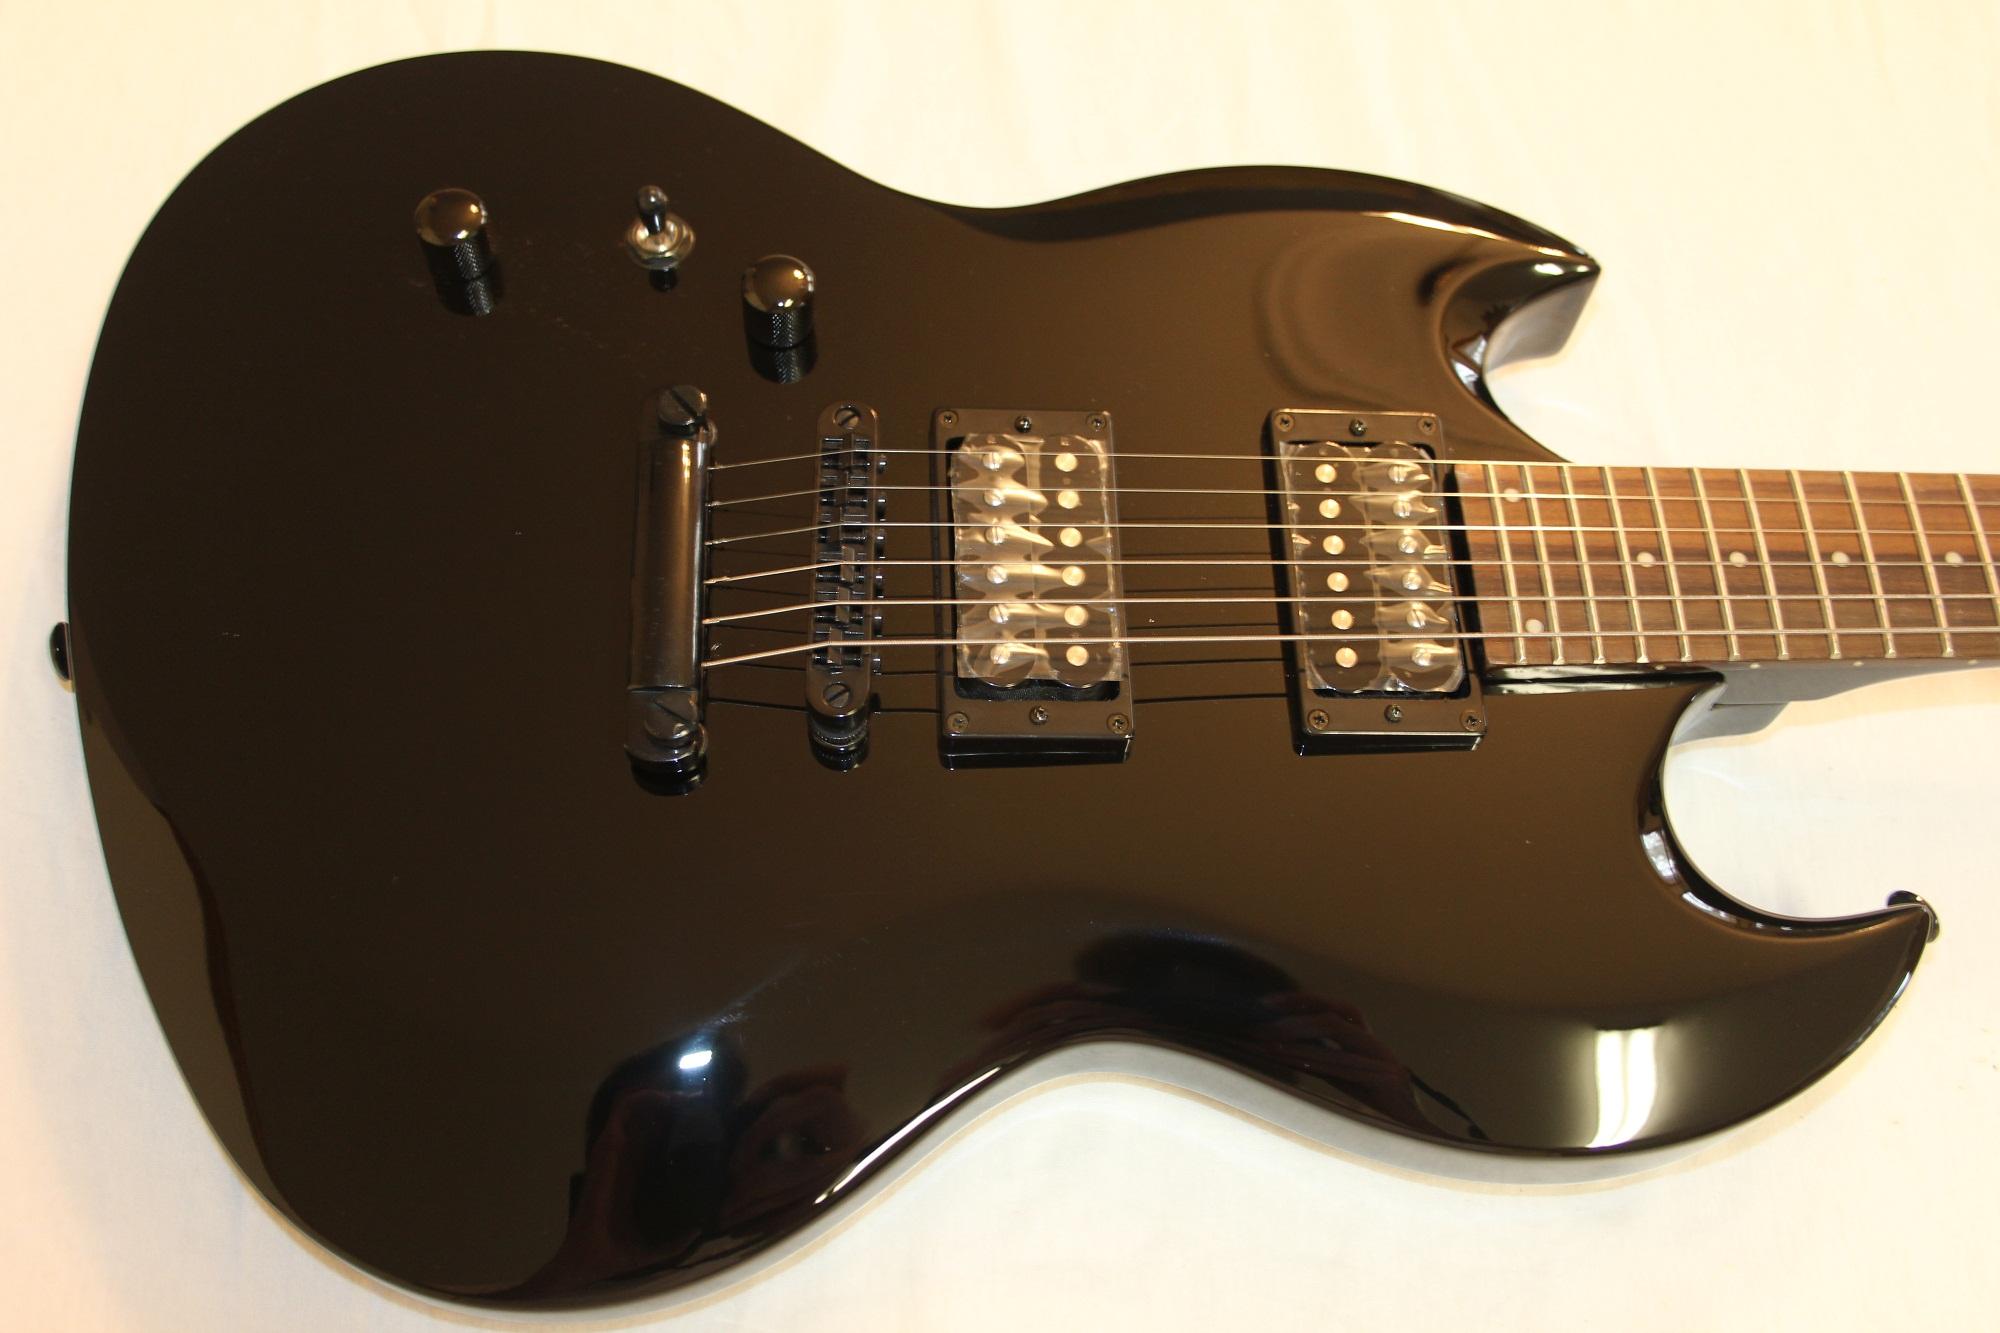 esp ltd viper 50 black left hand sample prototype electric guitar 6. Black Bedroom Furniture Sets. Home Design Ideas